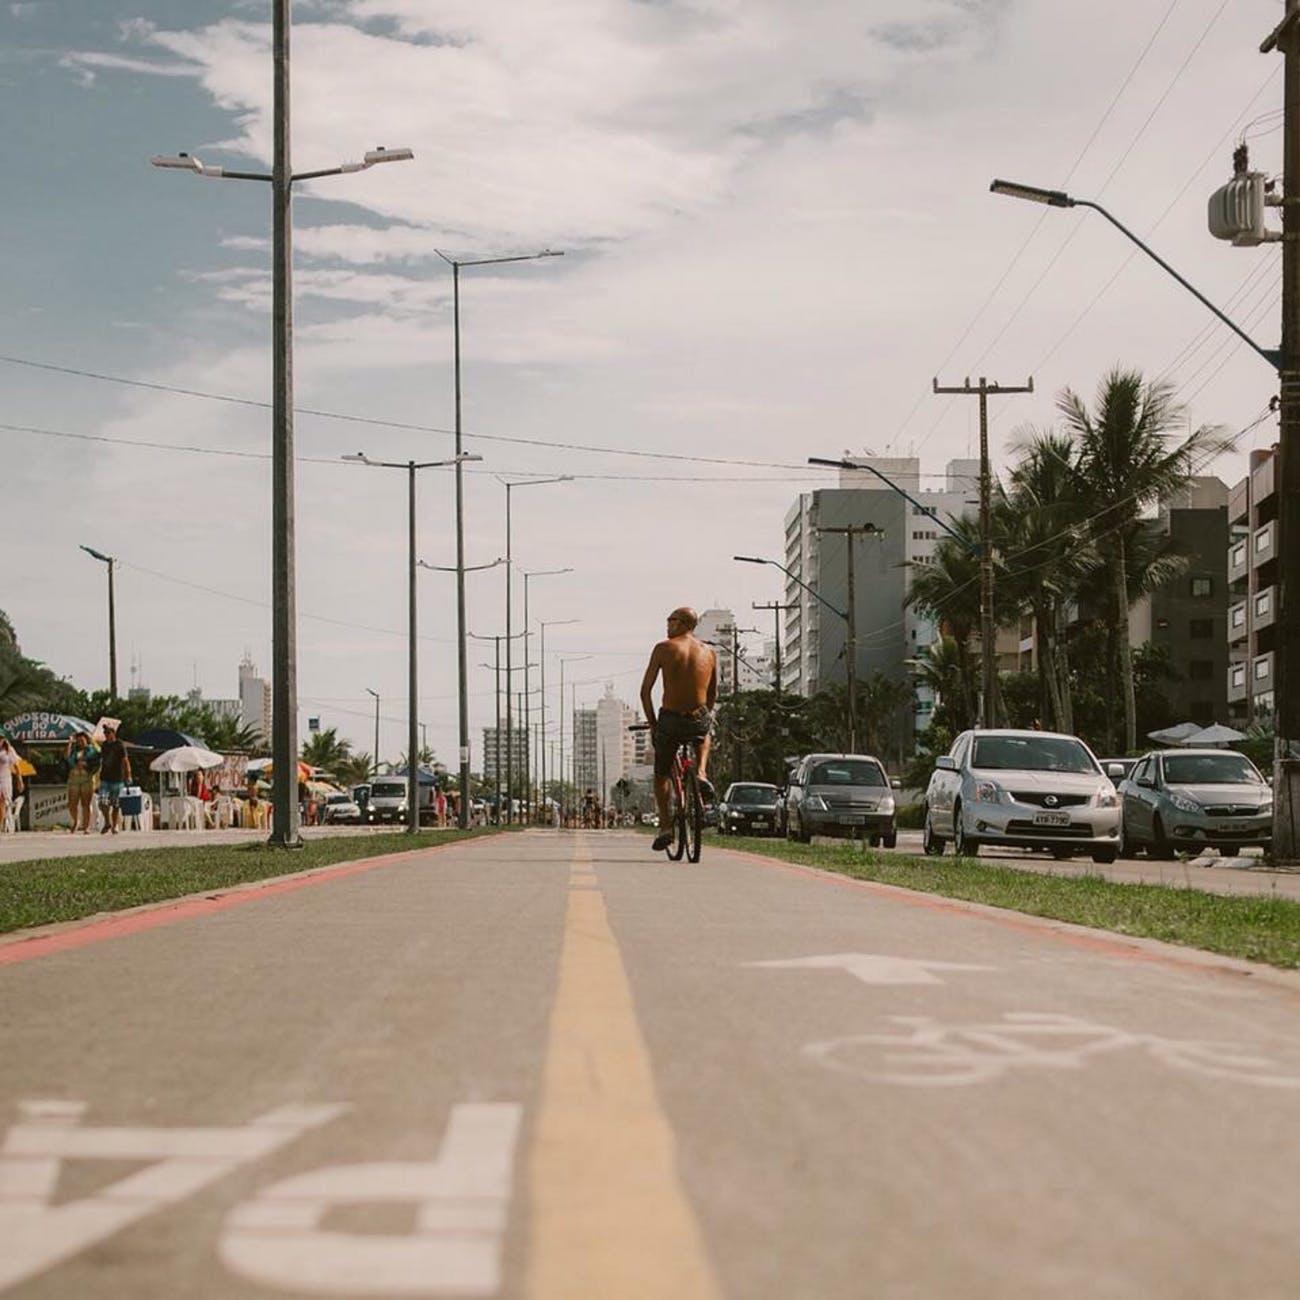 Edelstien.bicyclist .jpg